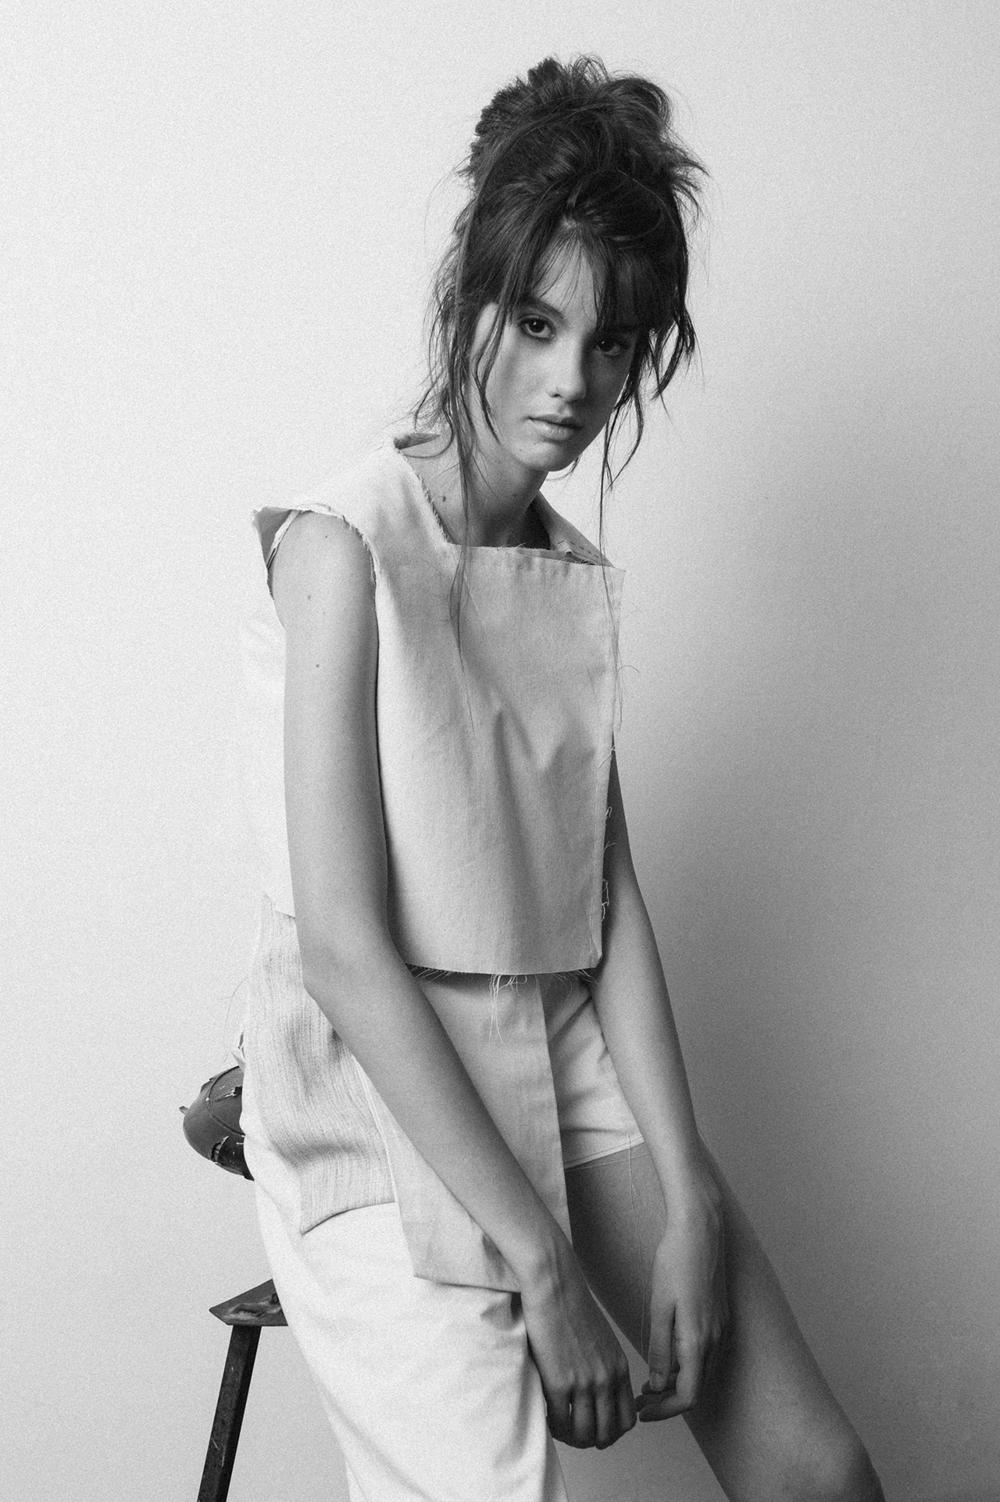 Chelsea_van_den_Berg_by_Beatriz_Maldonado_13.jpg